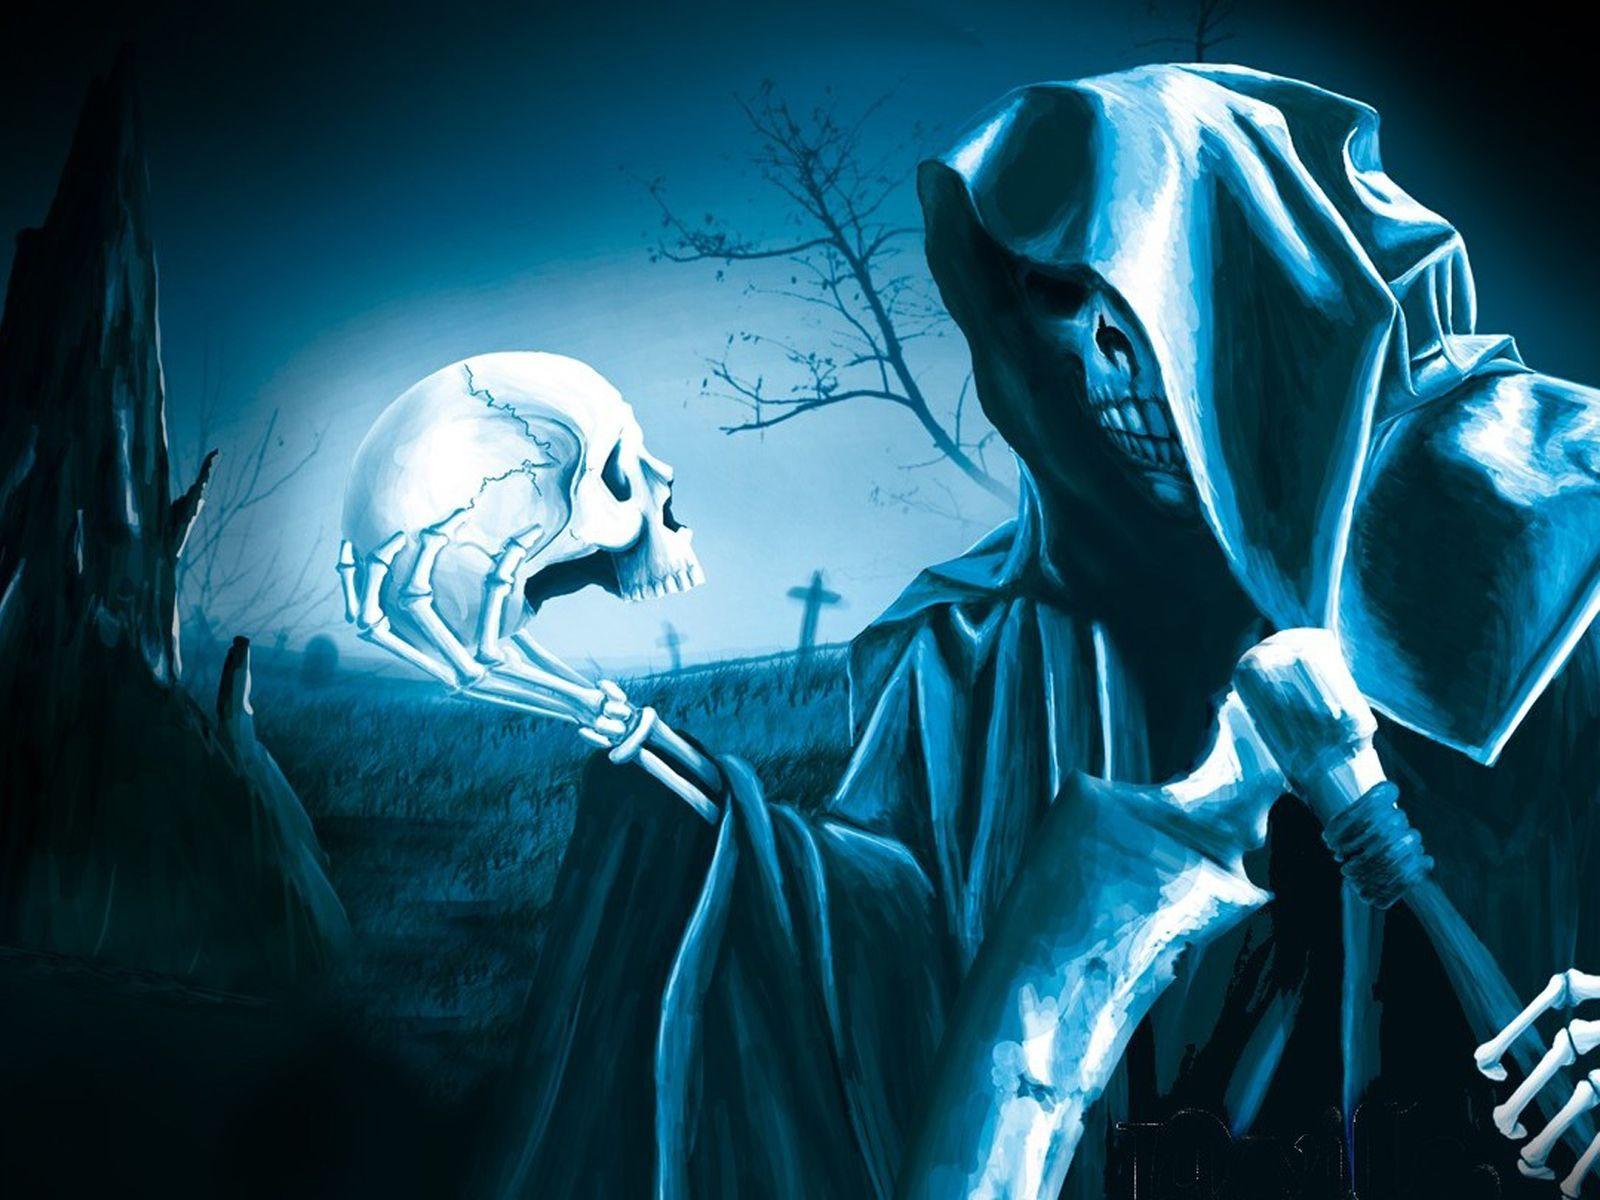 Cool Skulls On Blue Fire Background